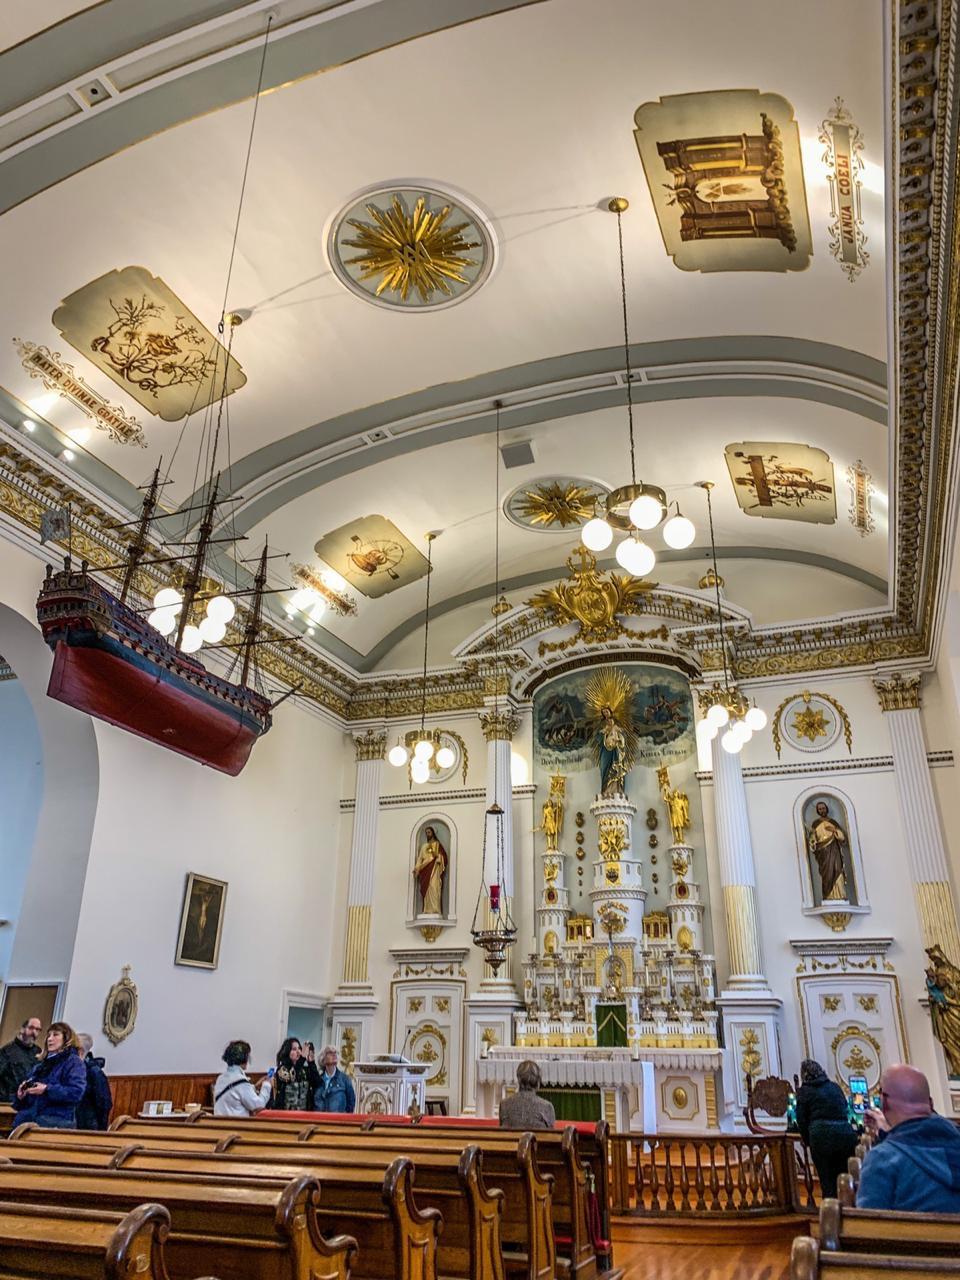 Notre-Dame-des-Victoires interior